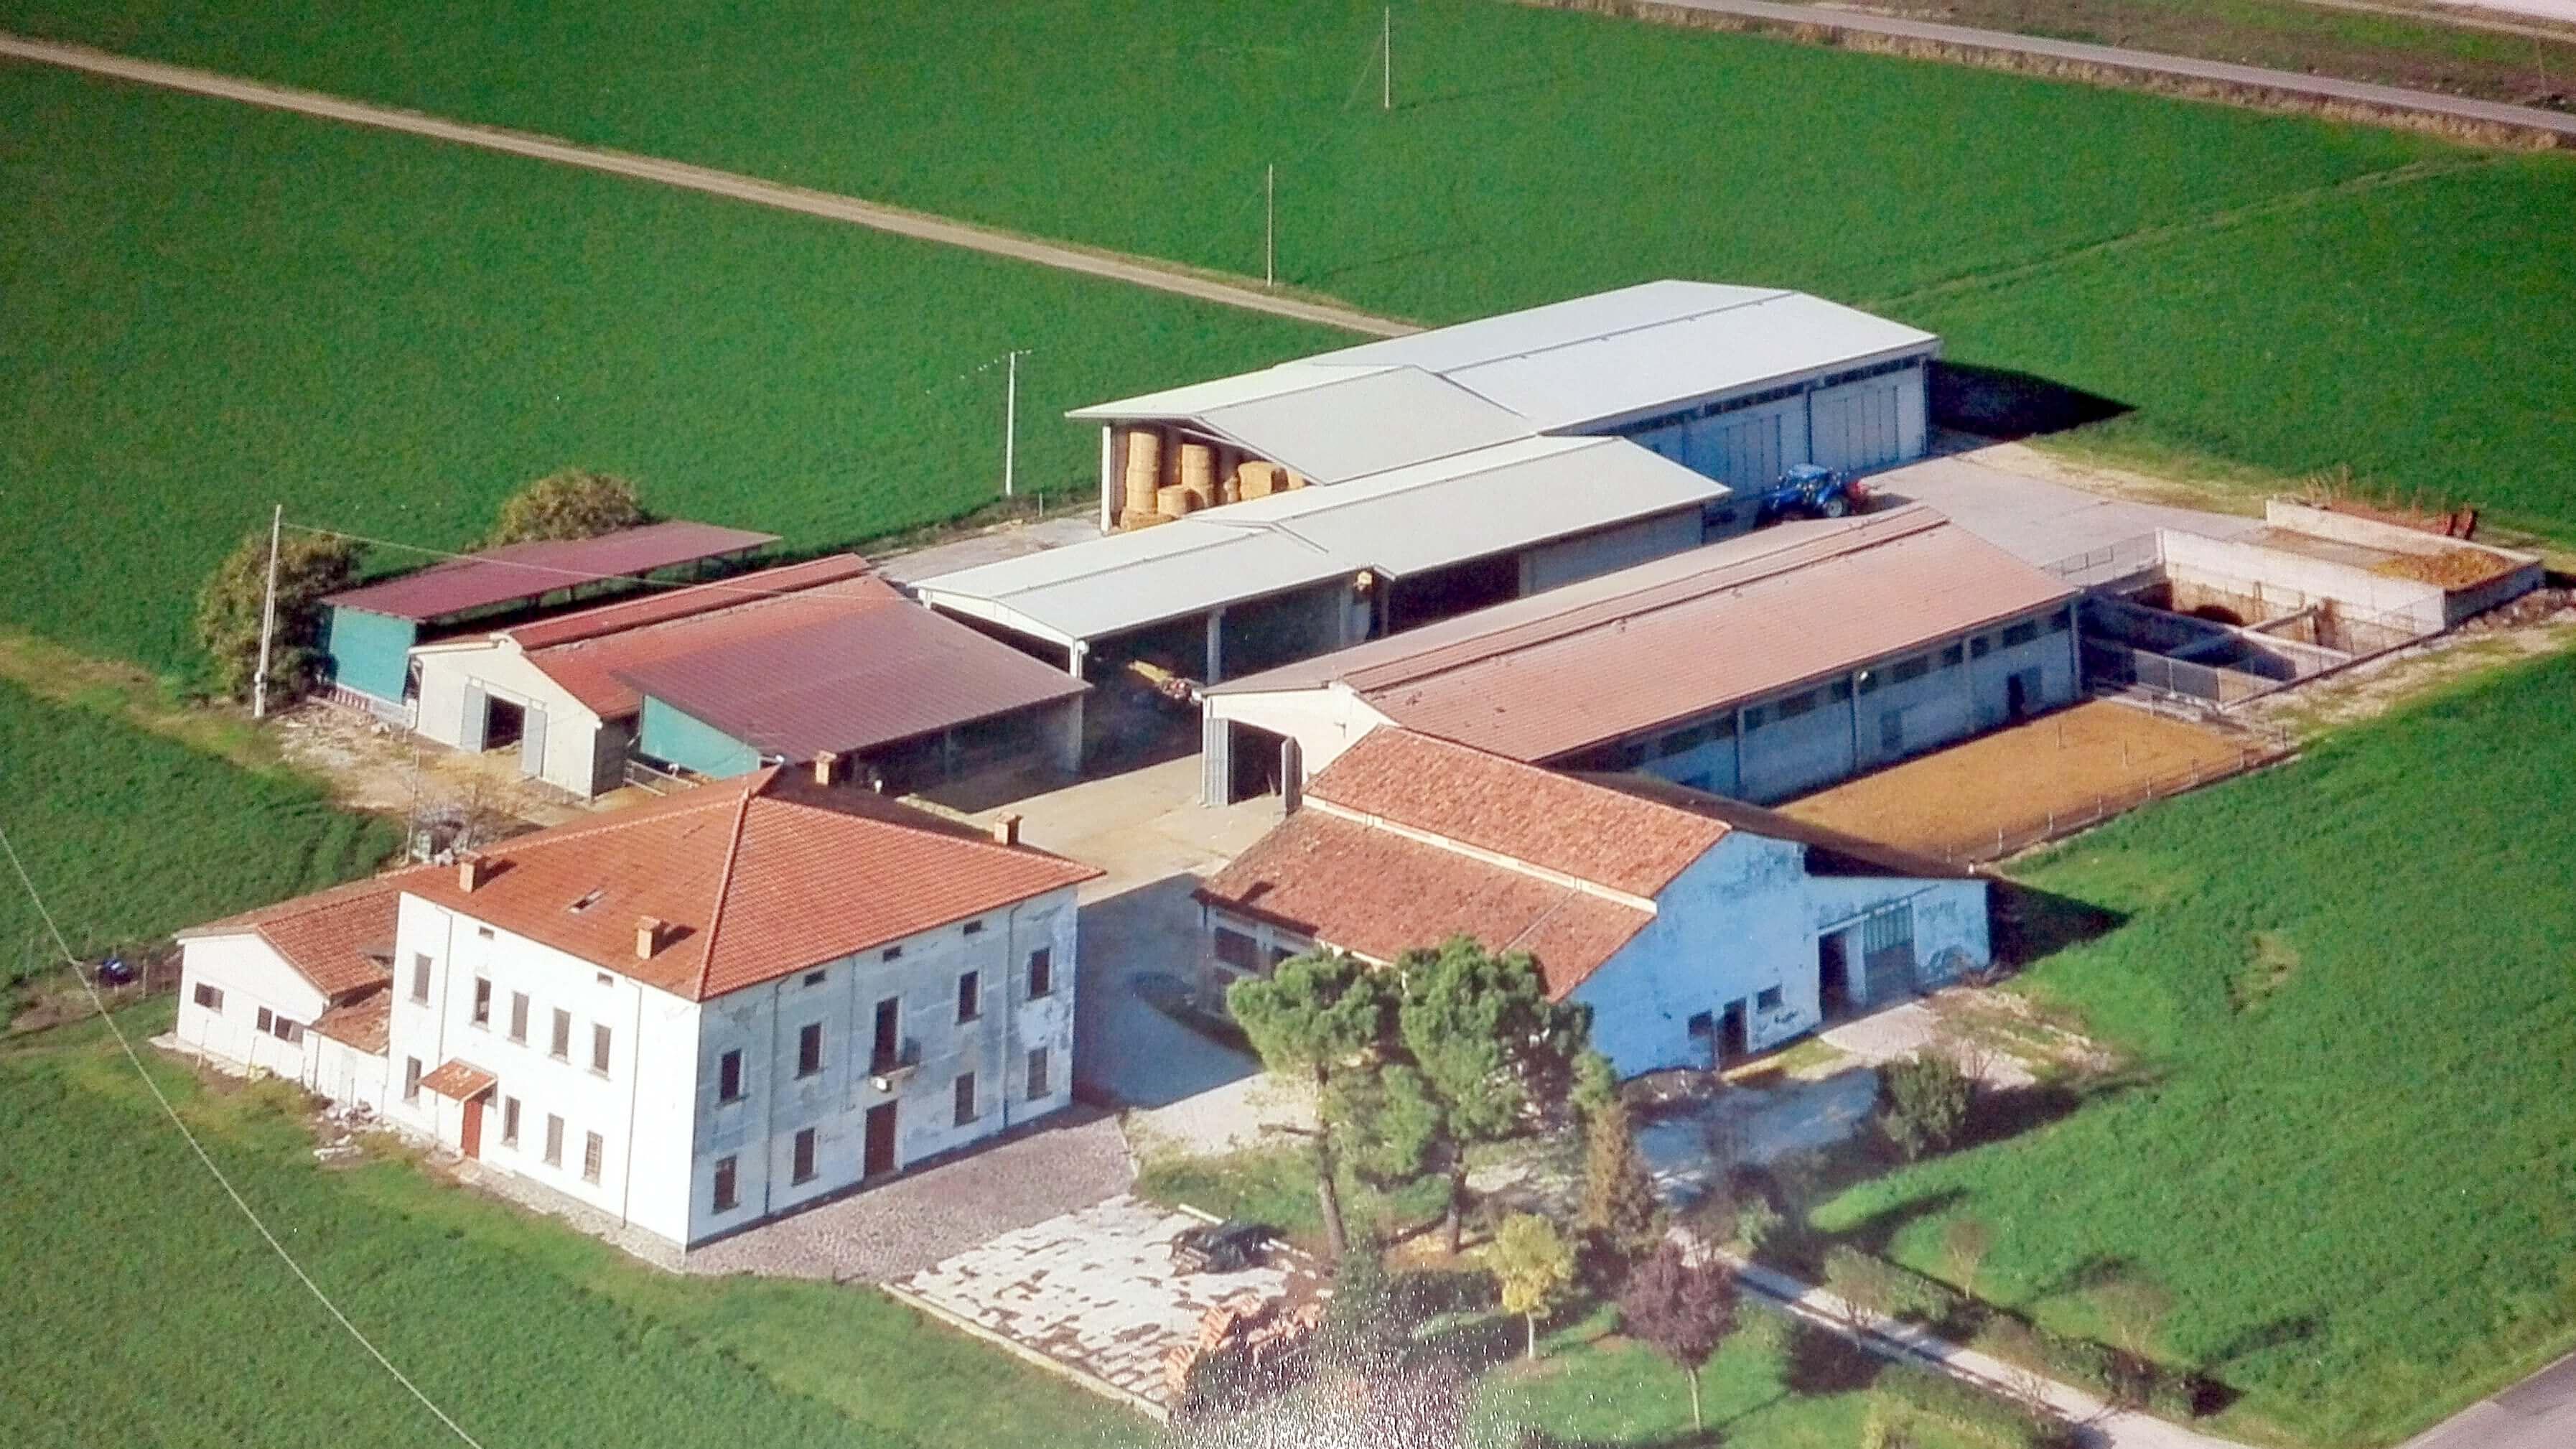 Azienda Agricola Soc. Agr. Luppi S.S.